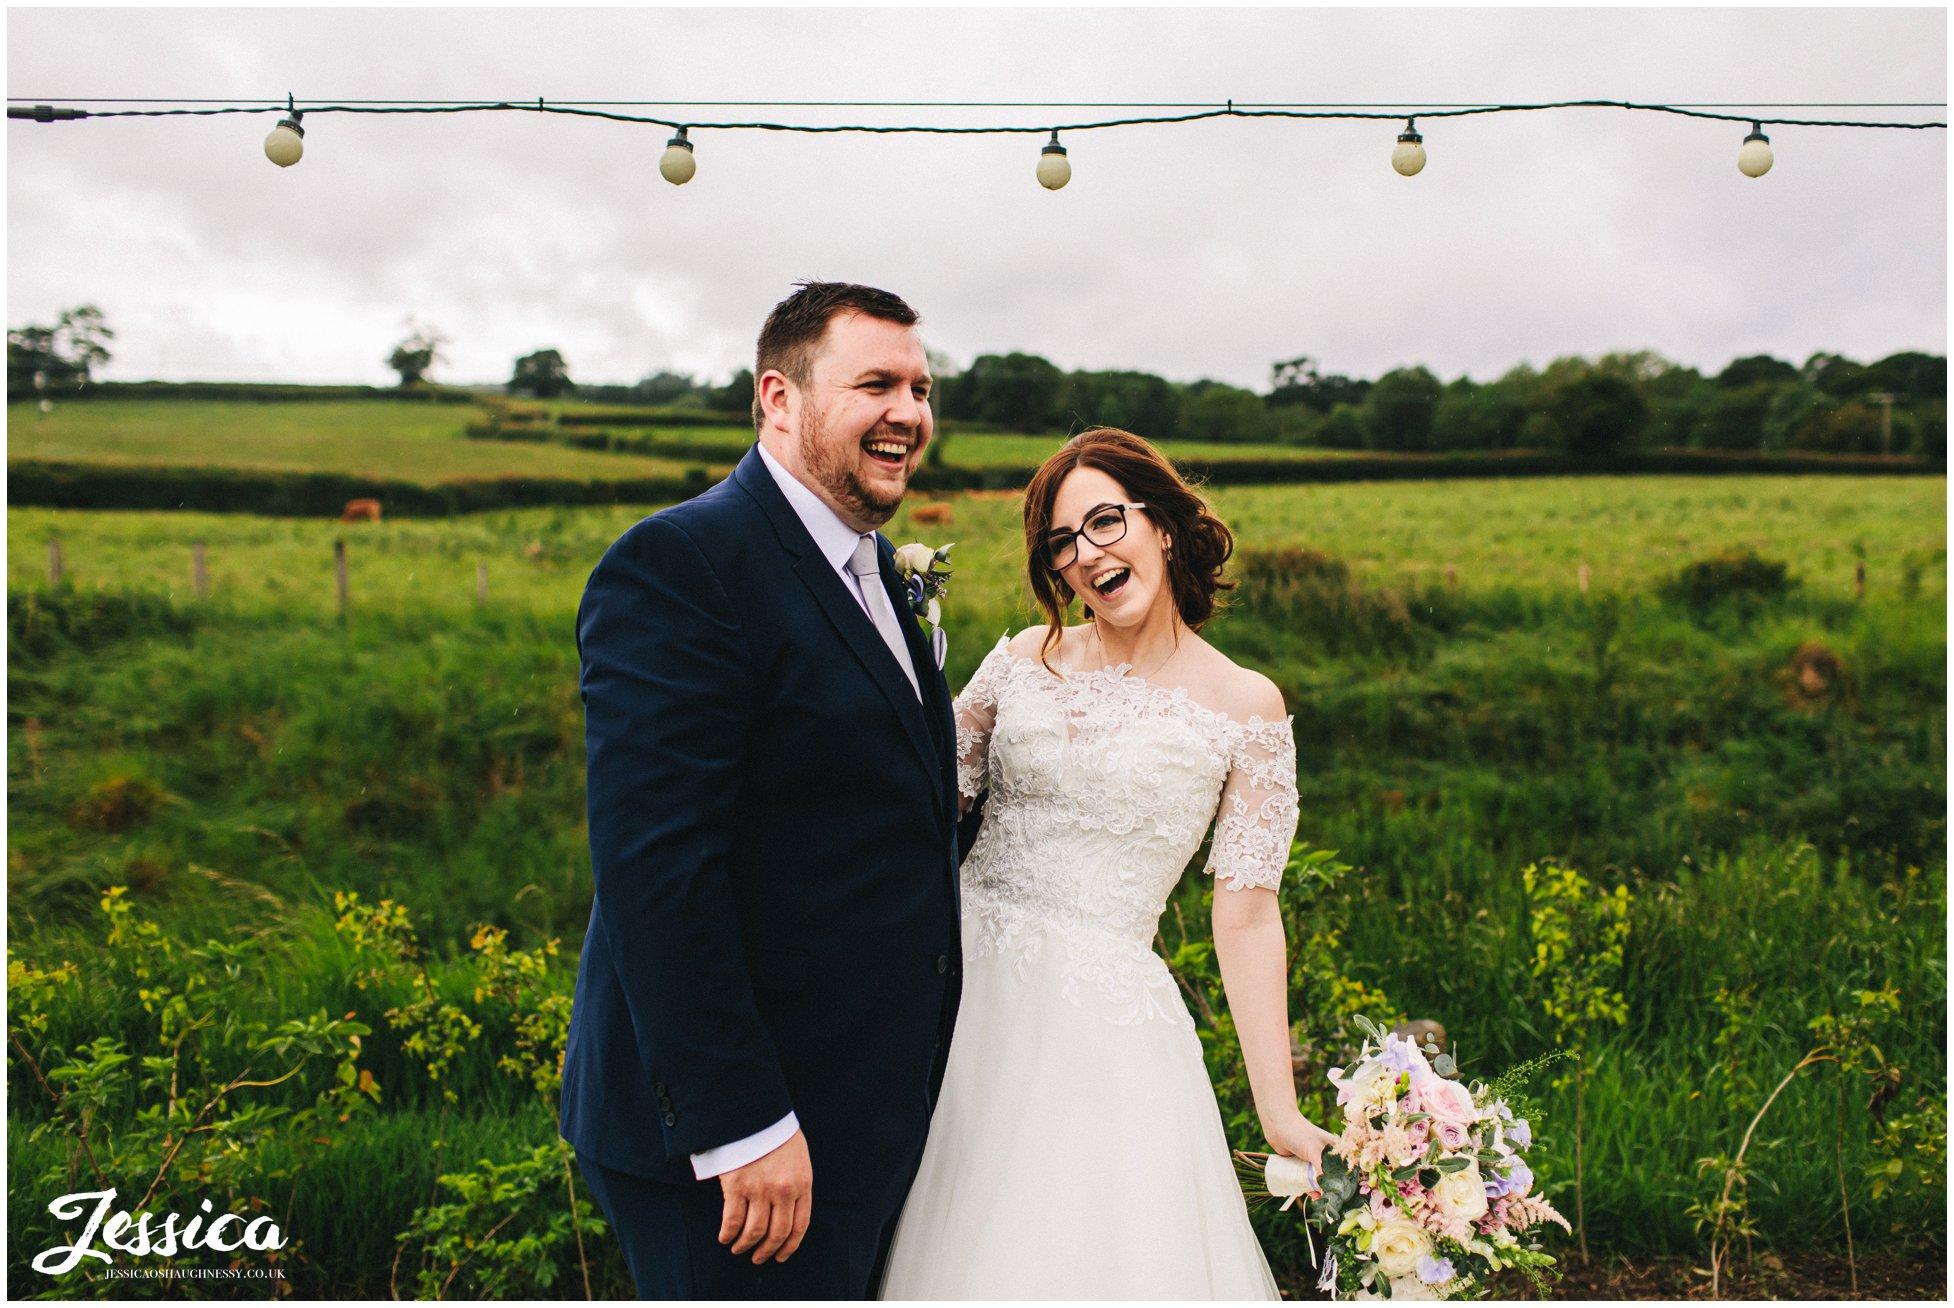 couple laugh under festoon lighting